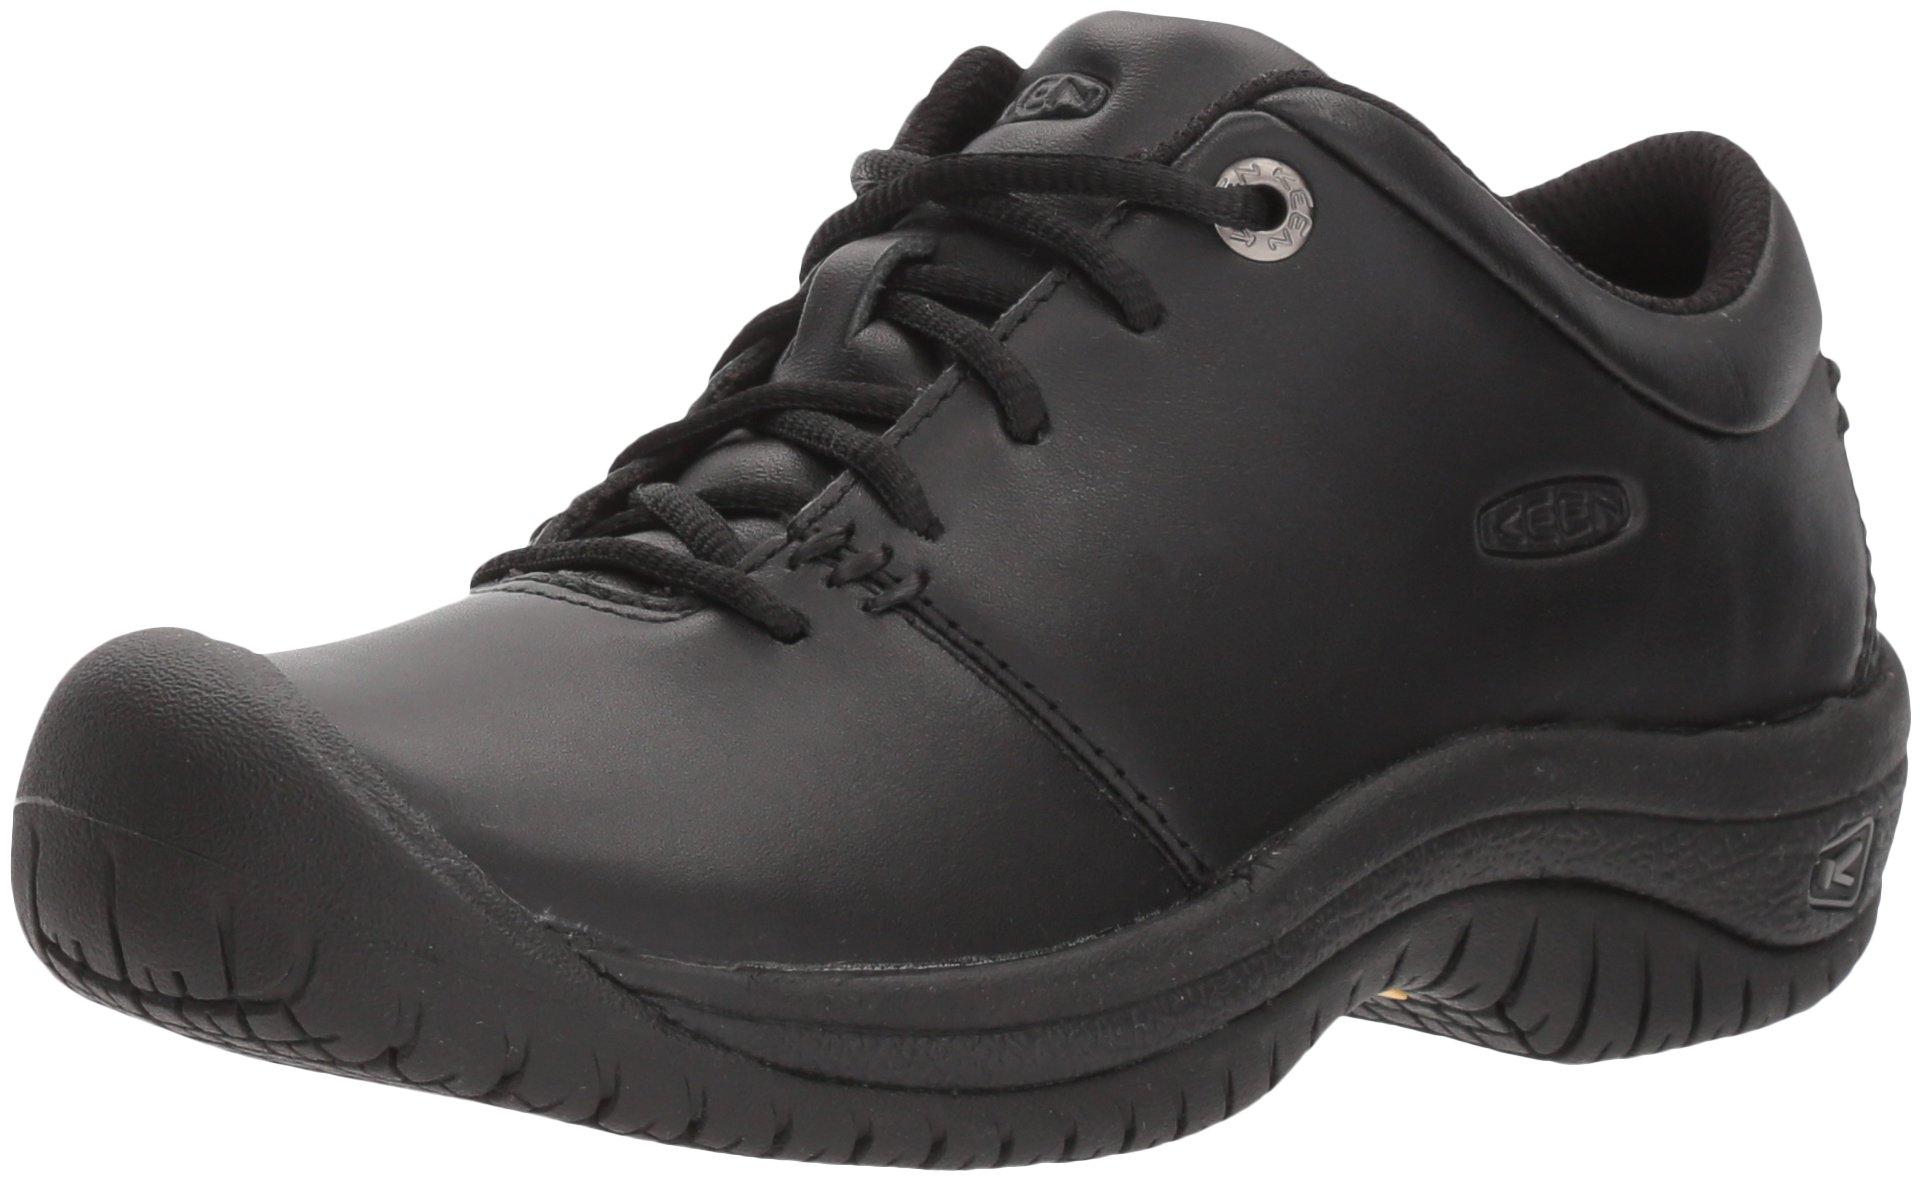 KEEN Utility Women's PTC Oxford Work Shoe,Black,7 M US